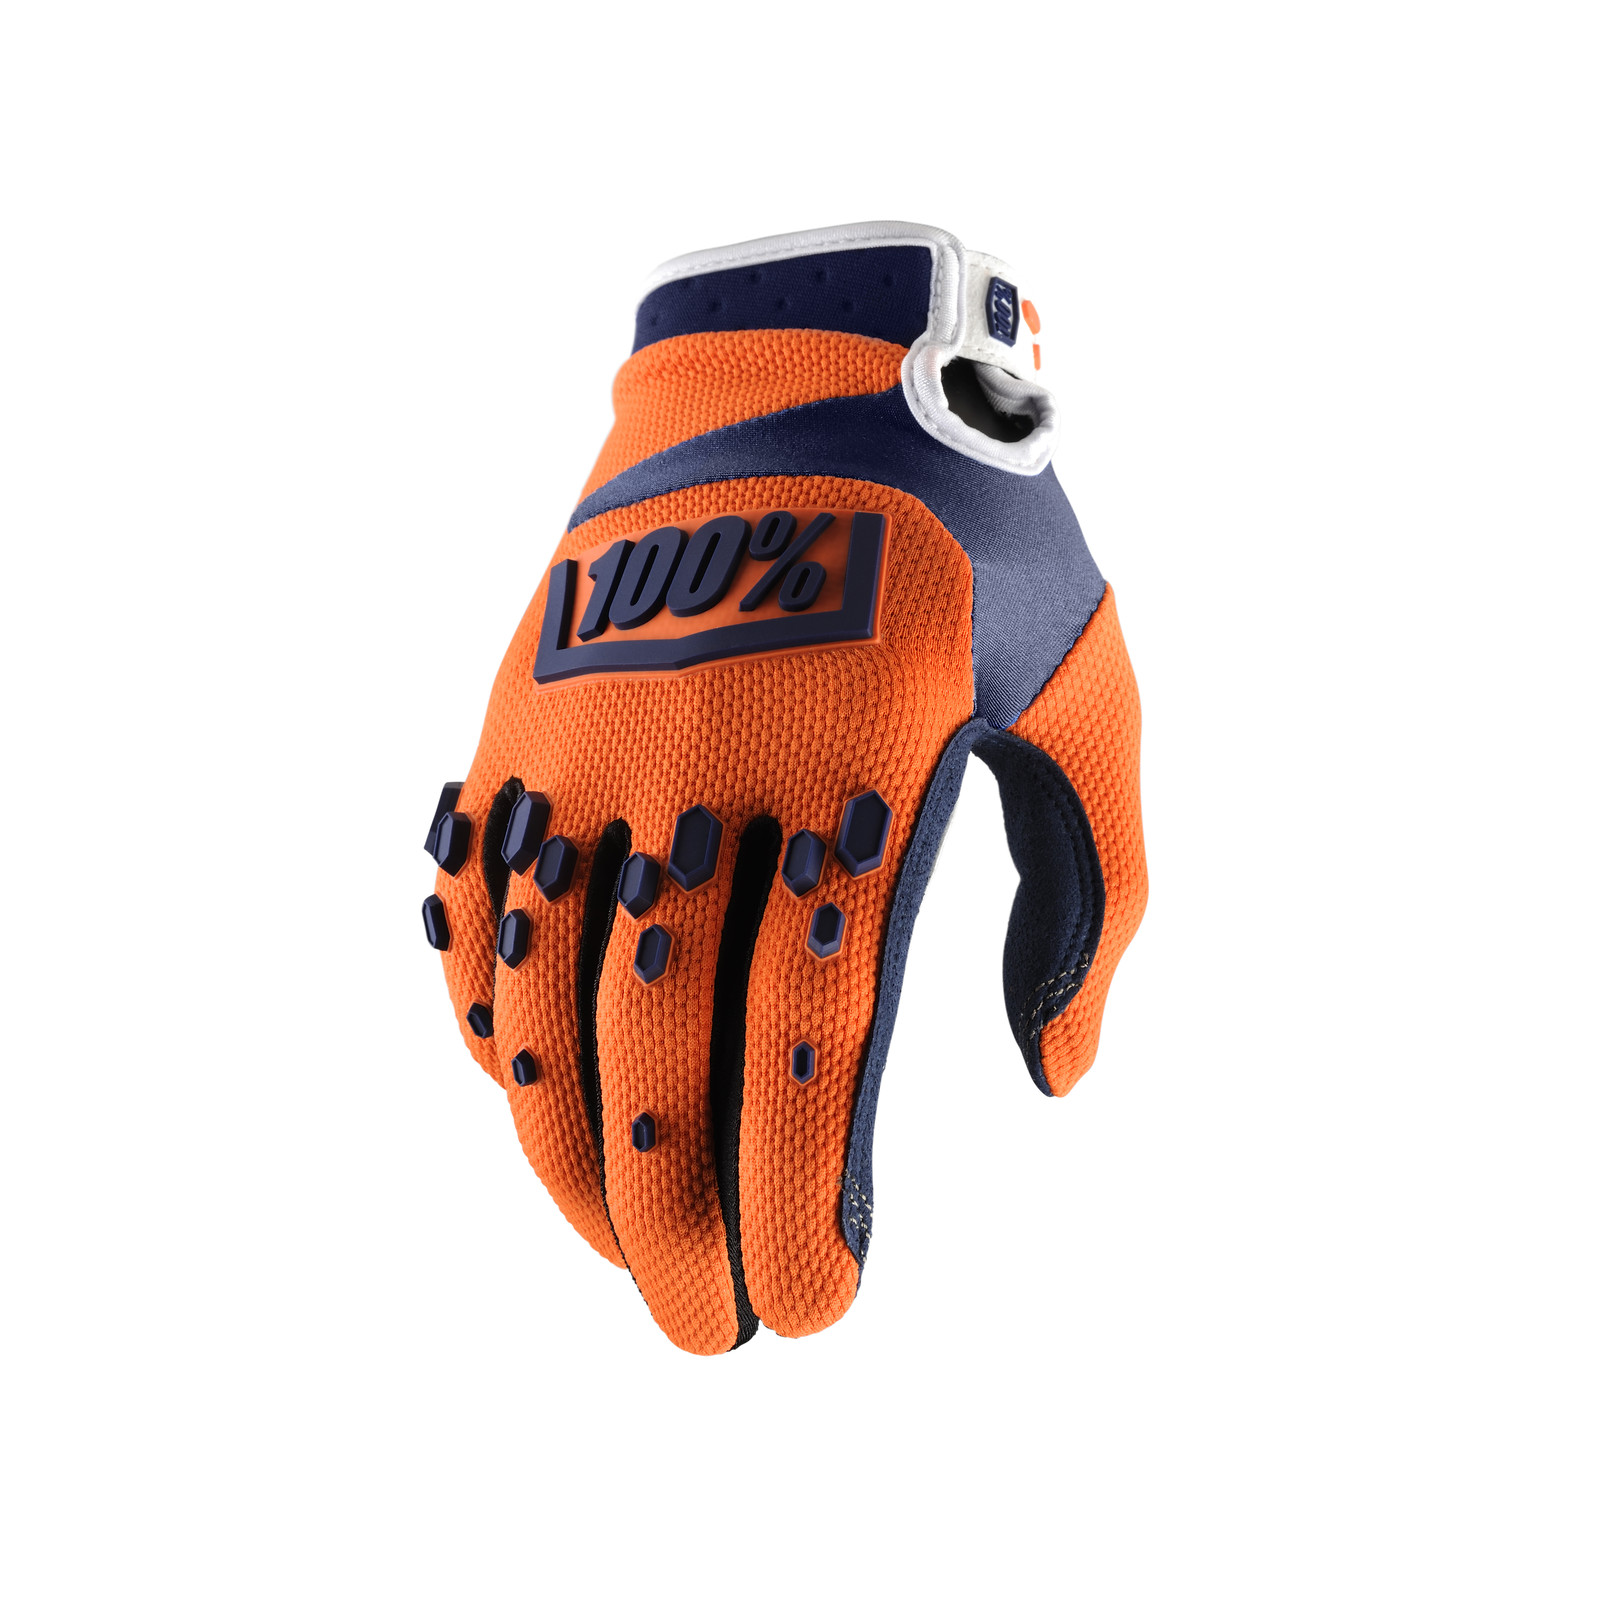 Airmatic Glove - Orange / Navy - 100percent - Motocross Pictures - Vital MX